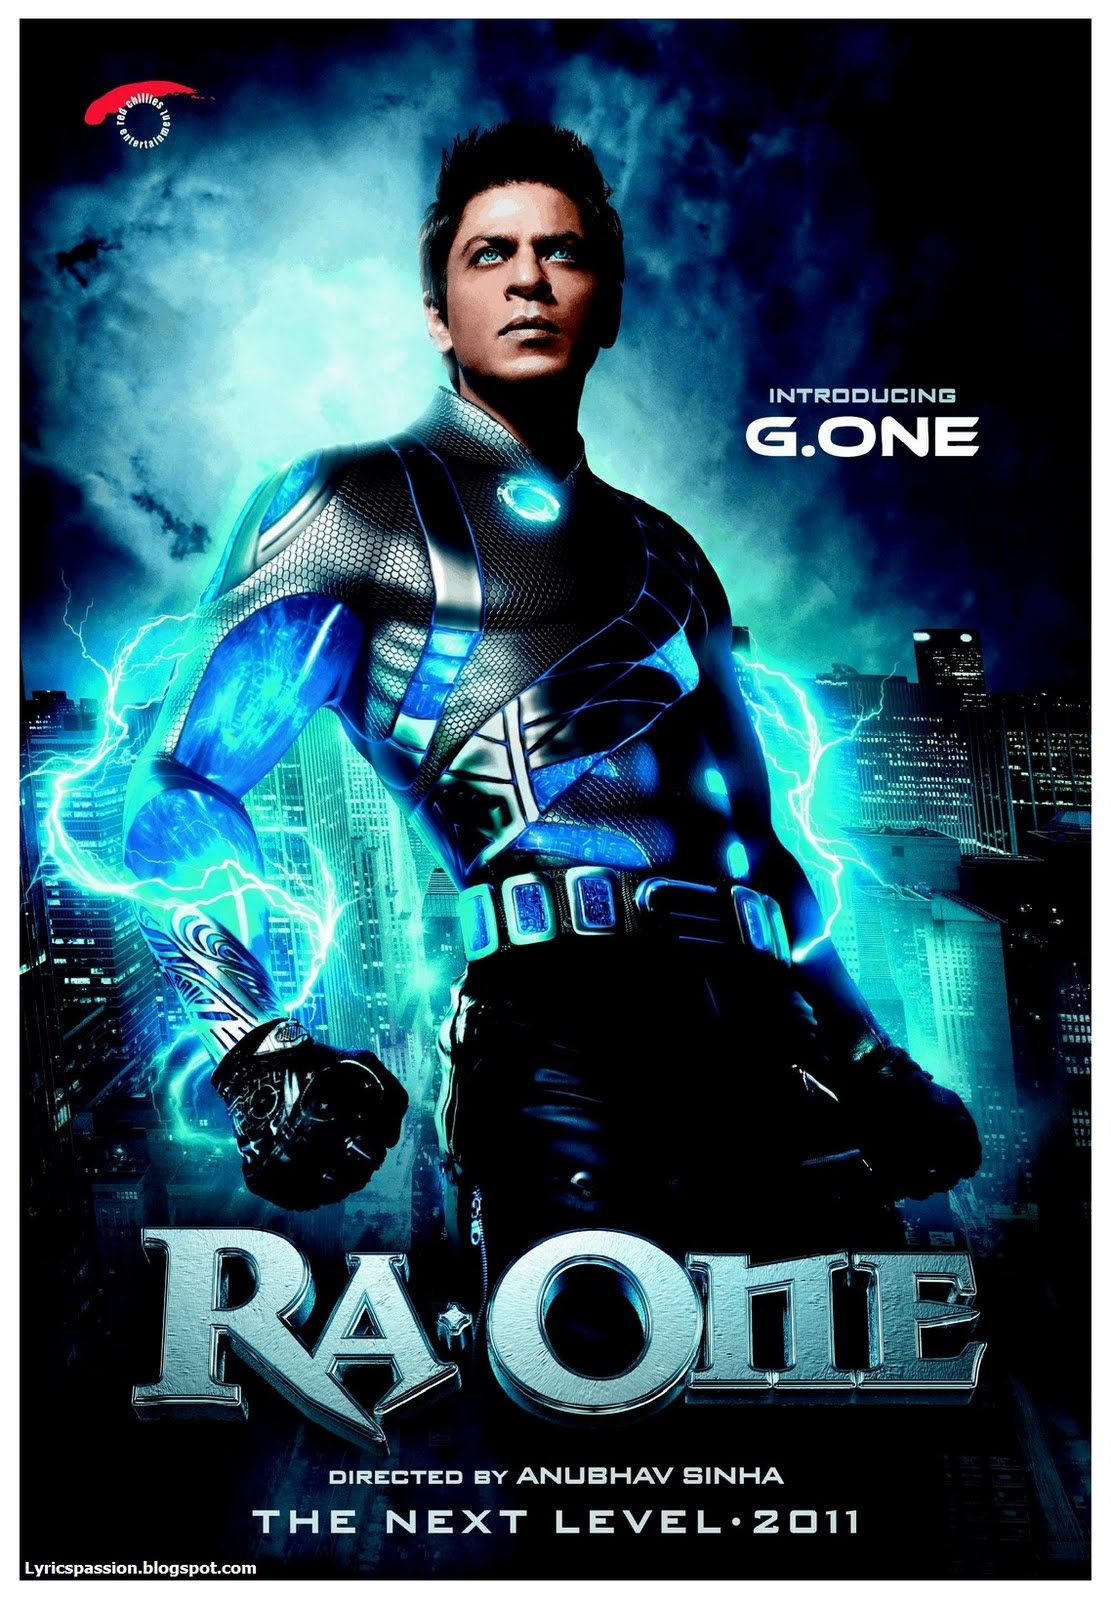 Criminal hindi movie video songs free download